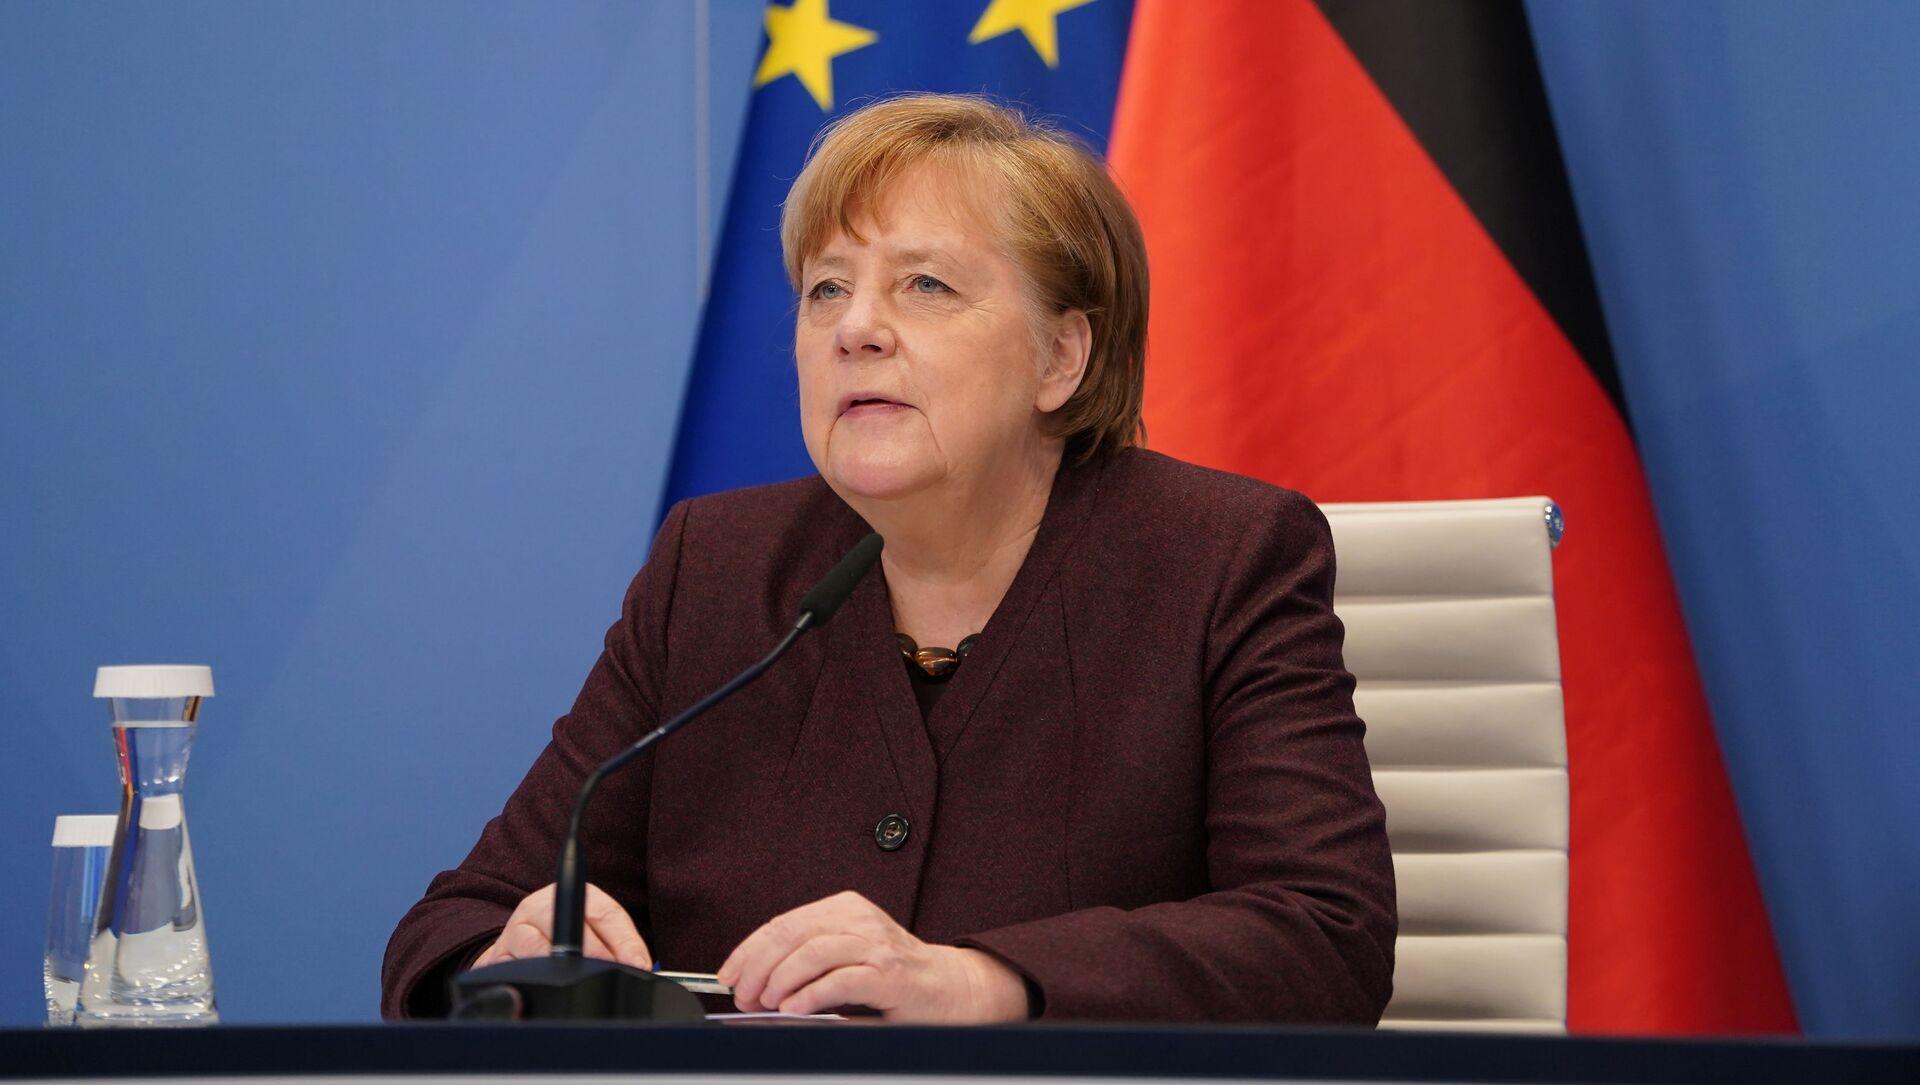 Angela Merkel, canciller alemana - Sputnik Mundo, 1920, 26.01.2021